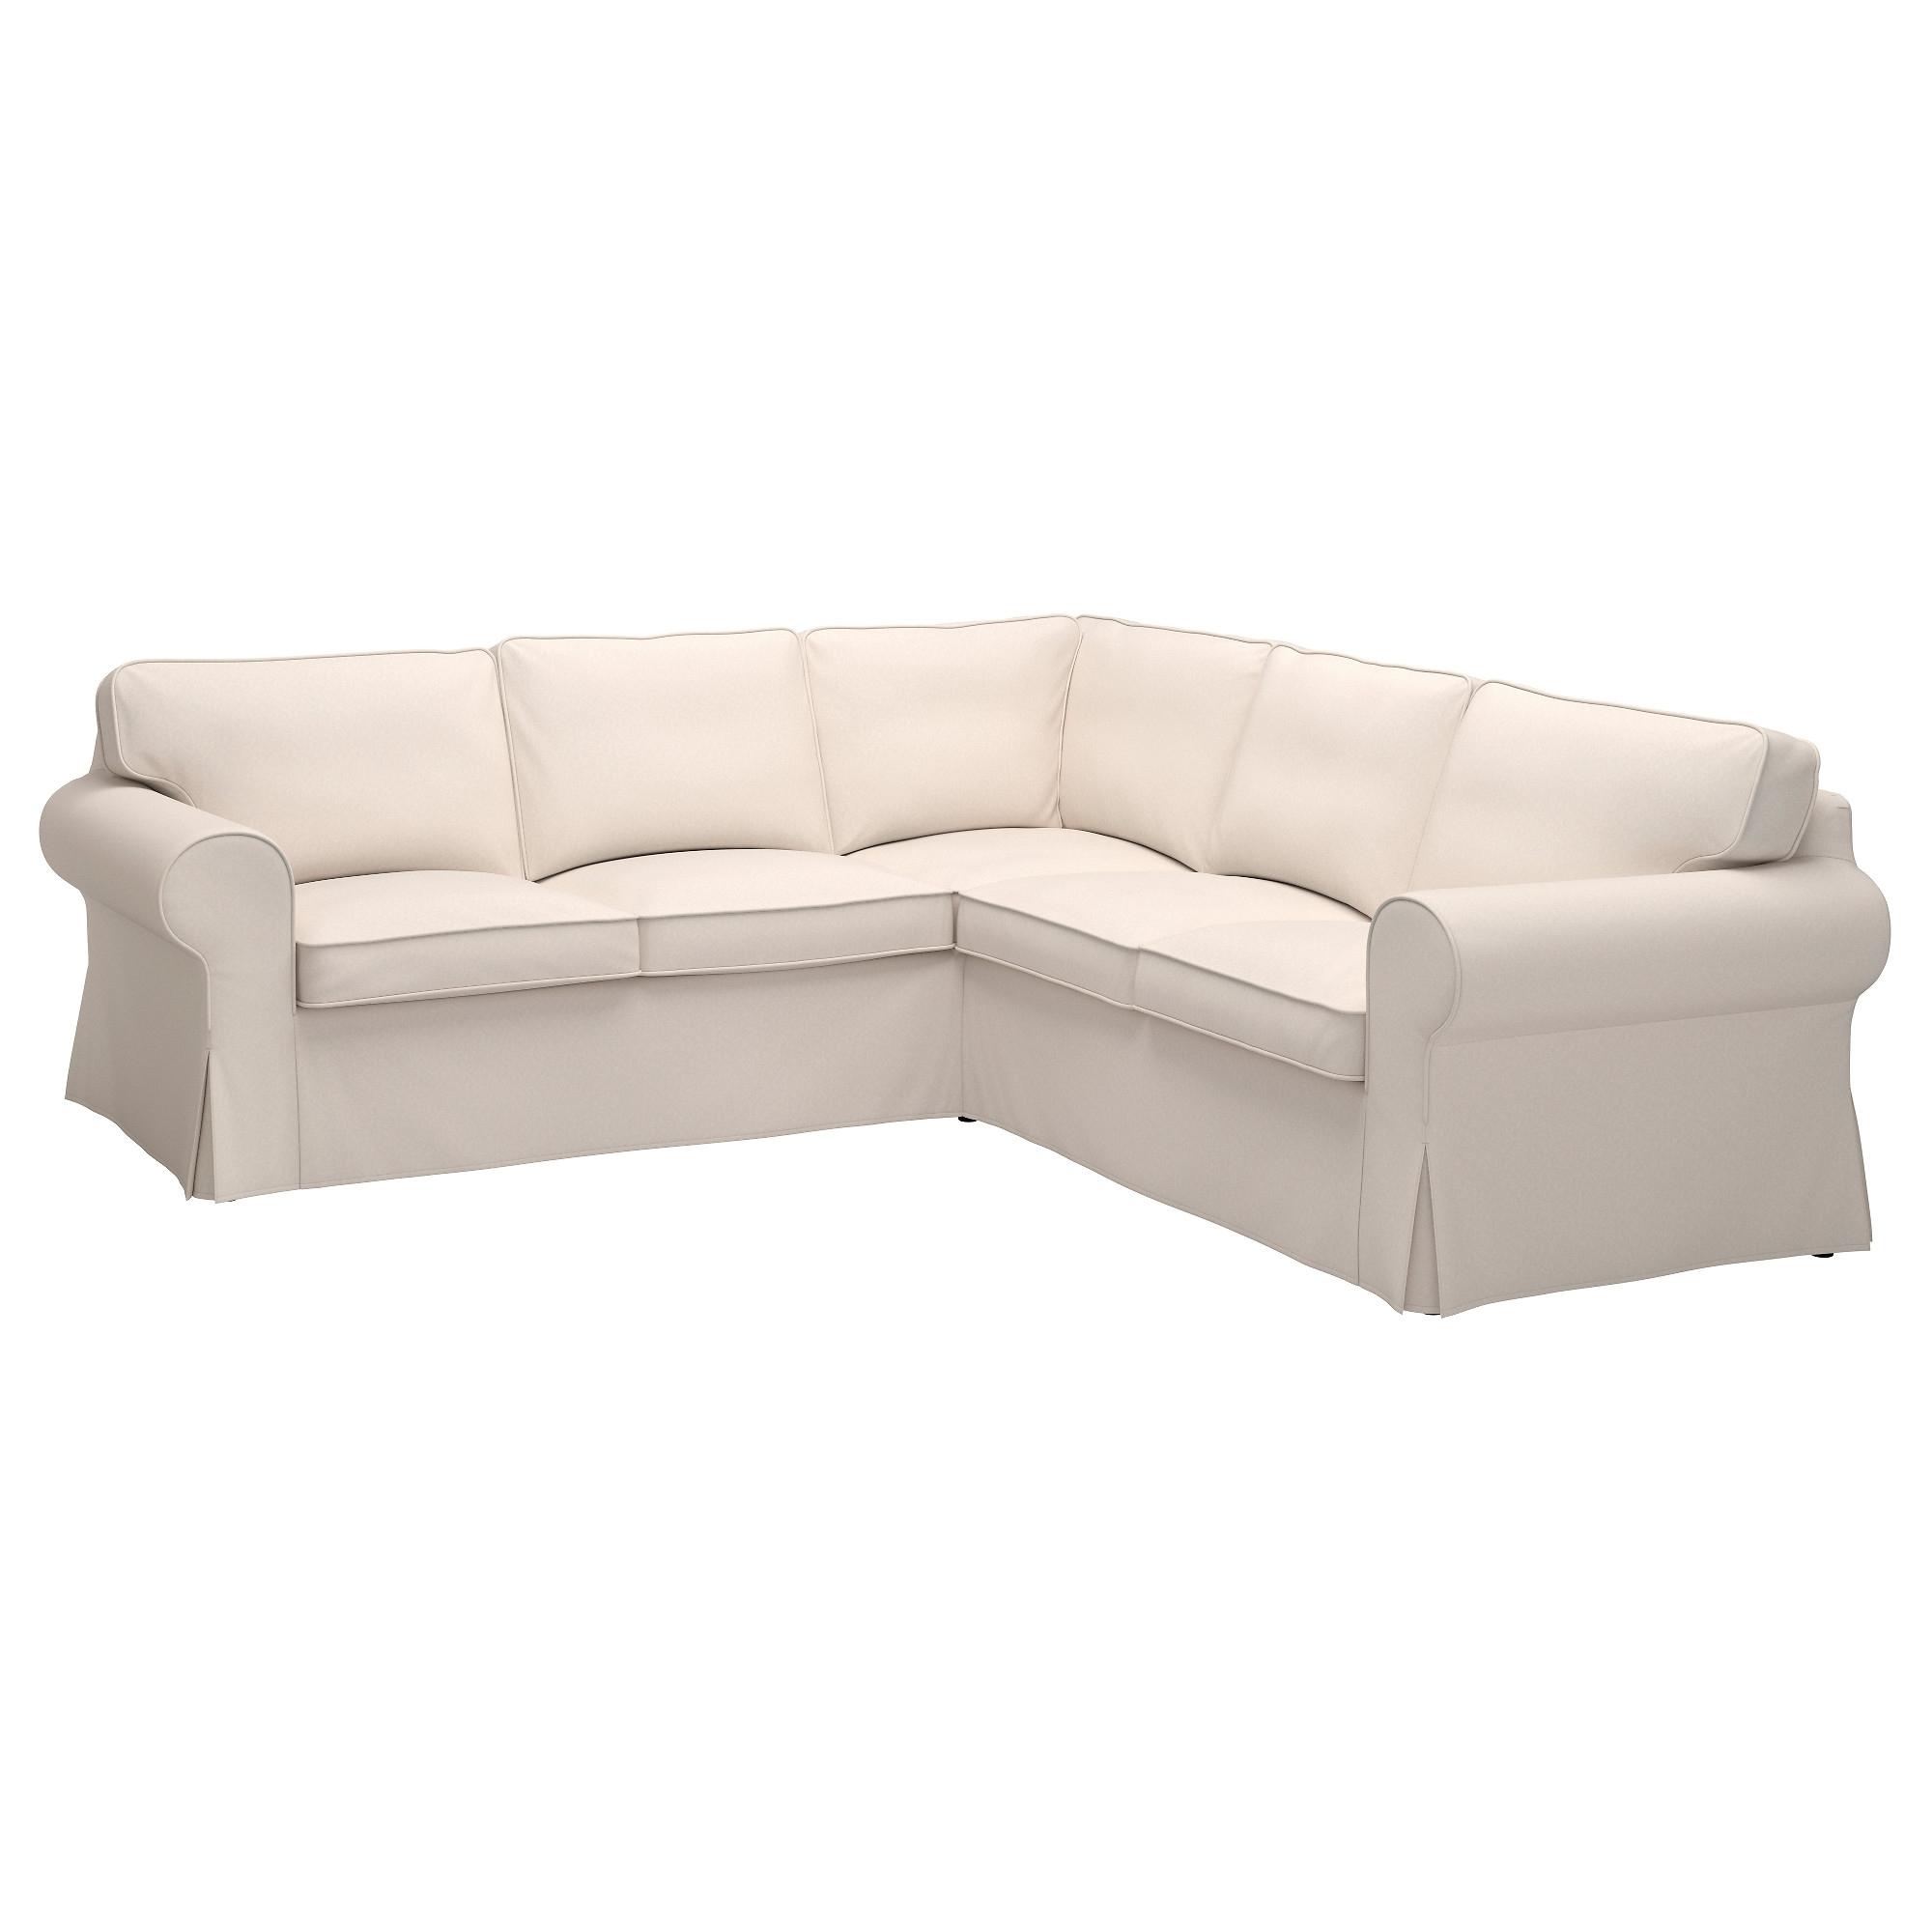 Popular Sectional Sofas At Ikea Regarding Ektorp Sectional, 4 Seat Corner – Nordvalla Dark Gray – Ikea (View 3 of 20)